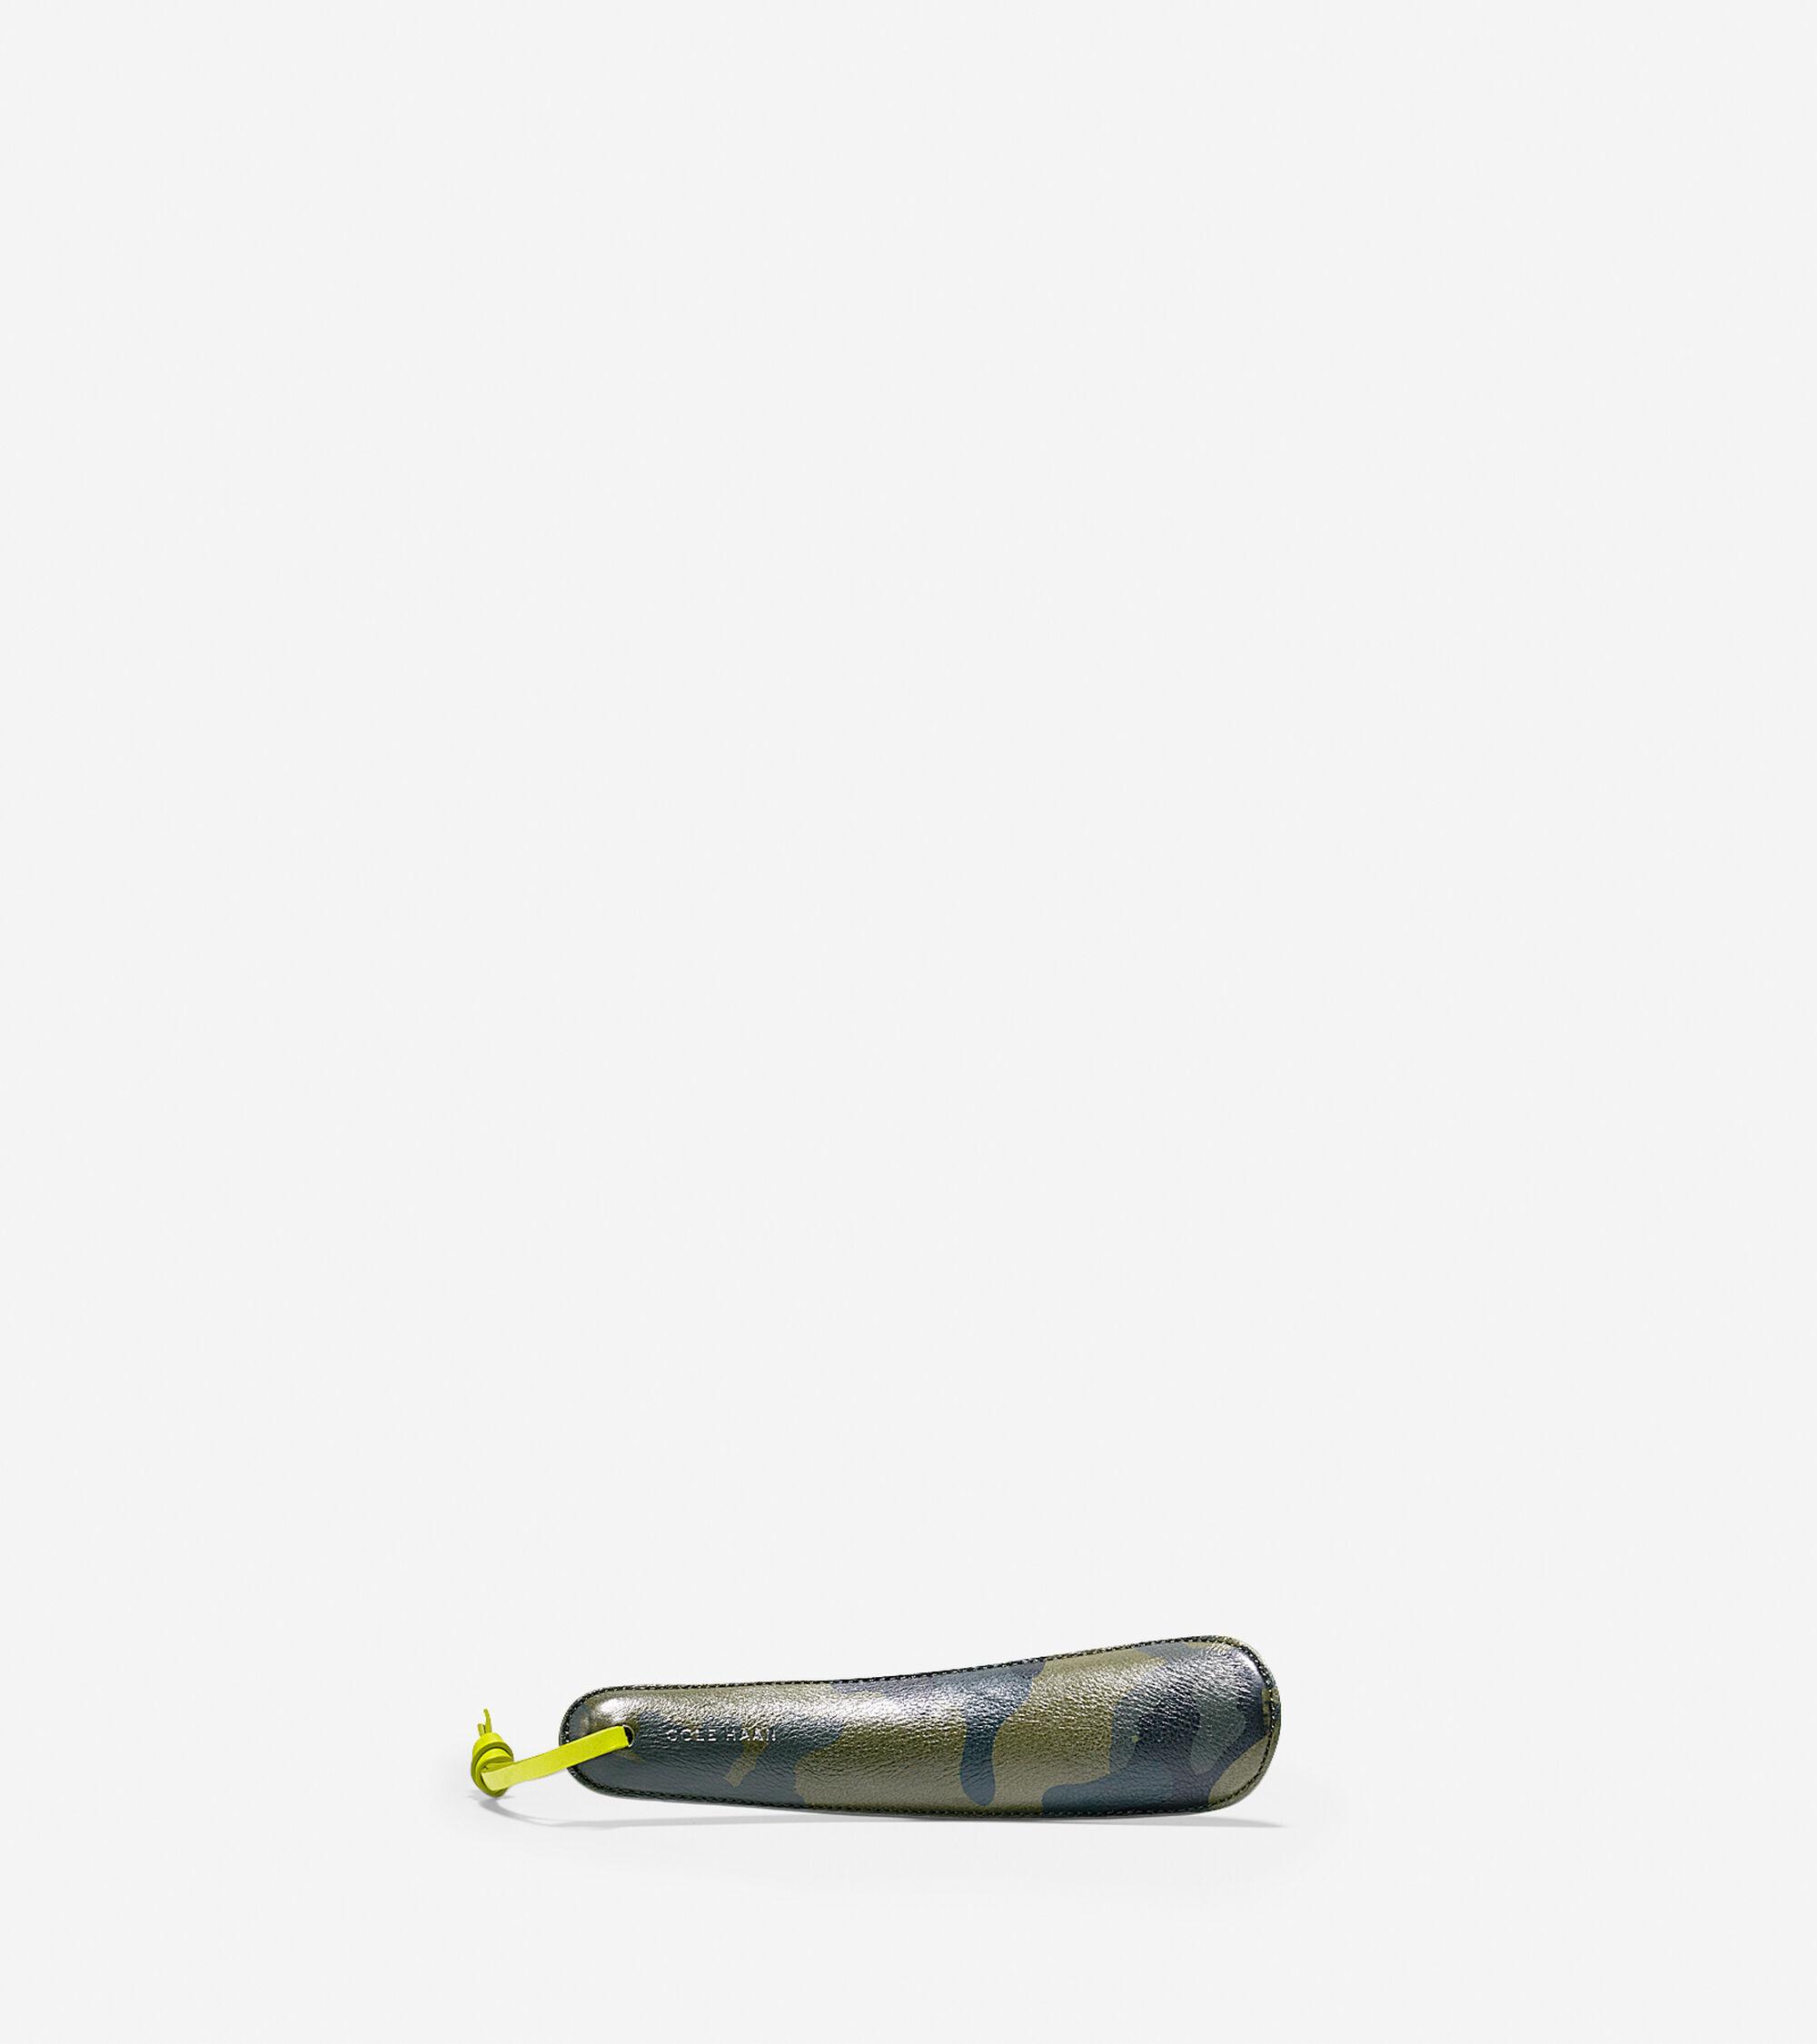 Accessories > Camo Shoe Horn